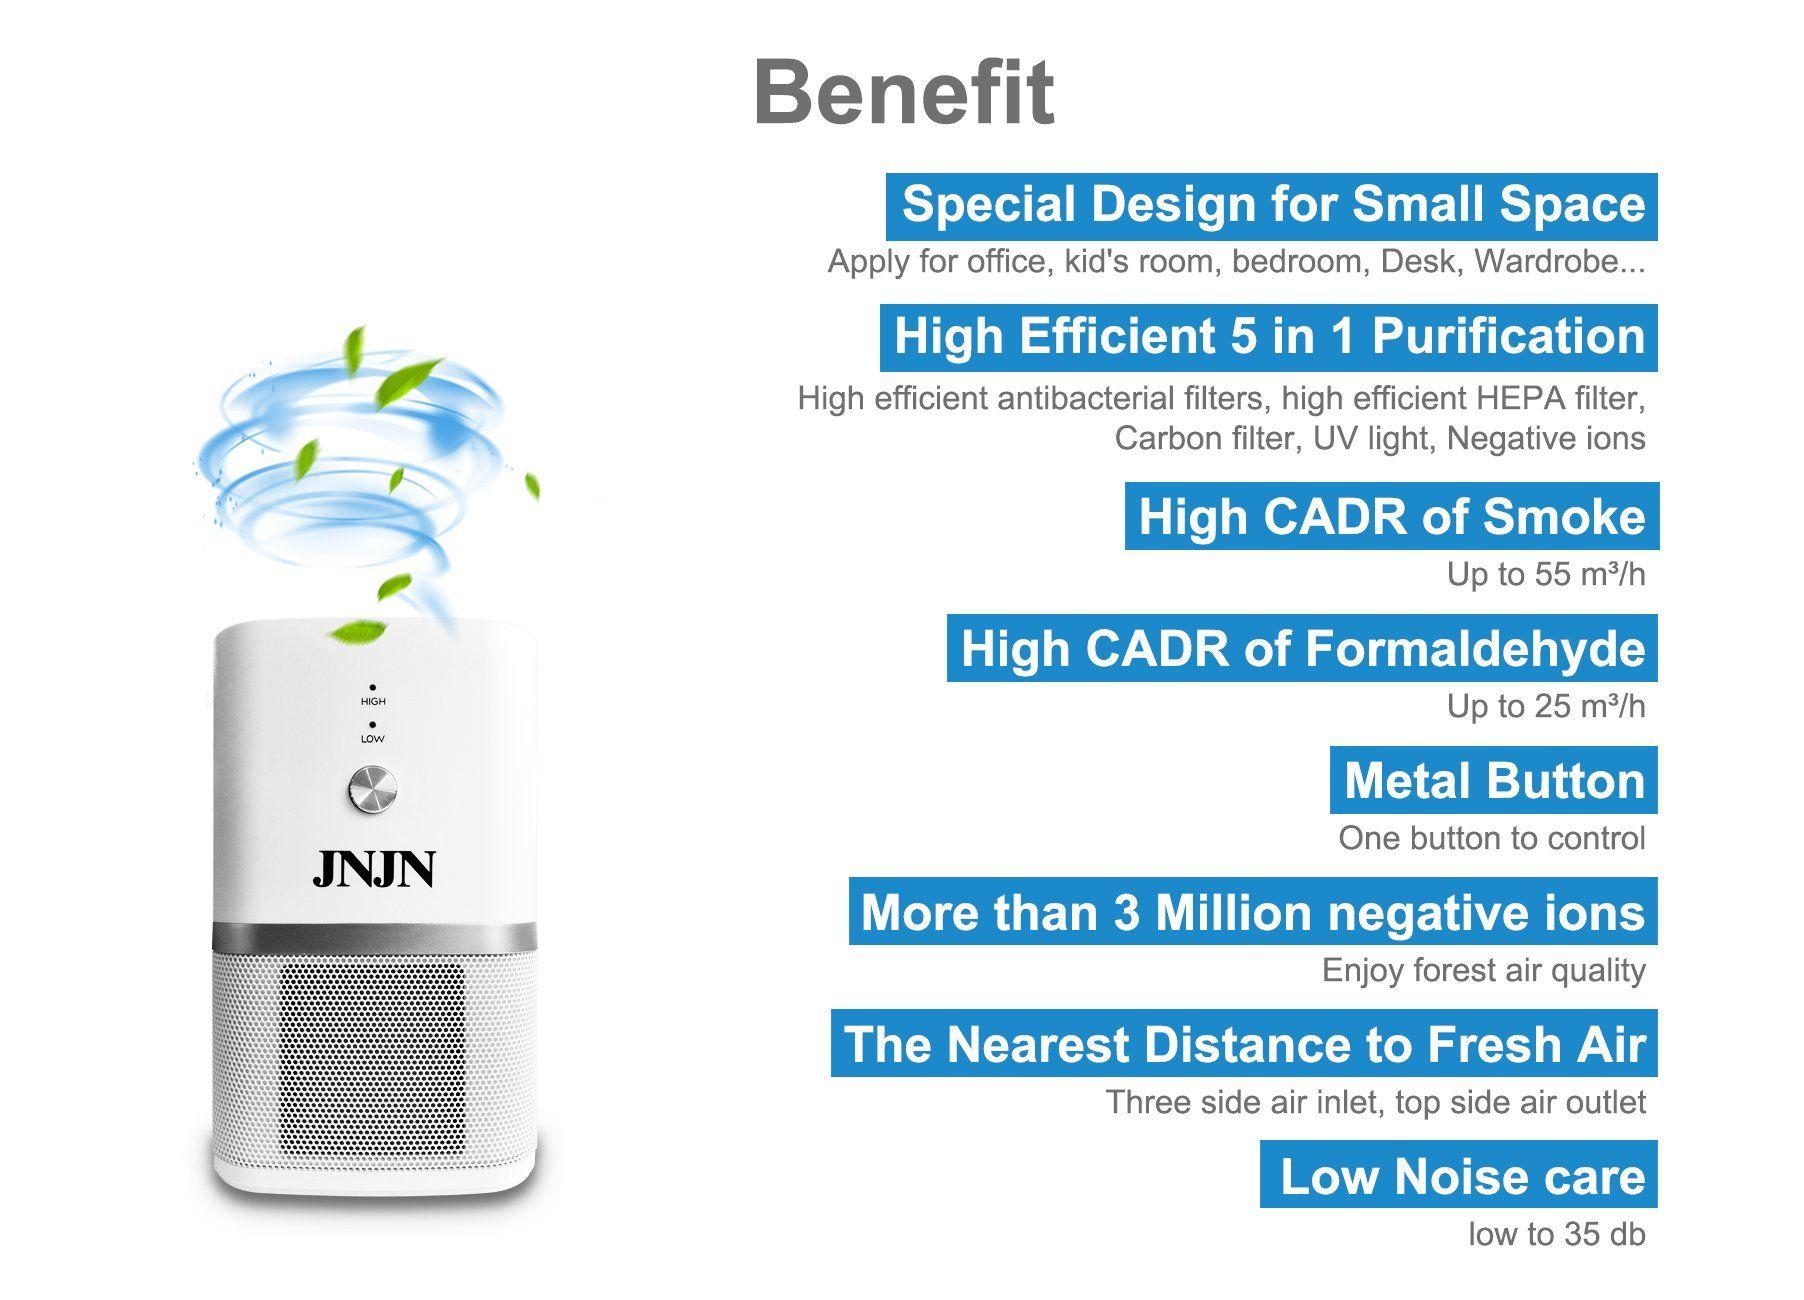 JNJN KJ55FDD05 5in1 Air Purifier with True HEPA Filter